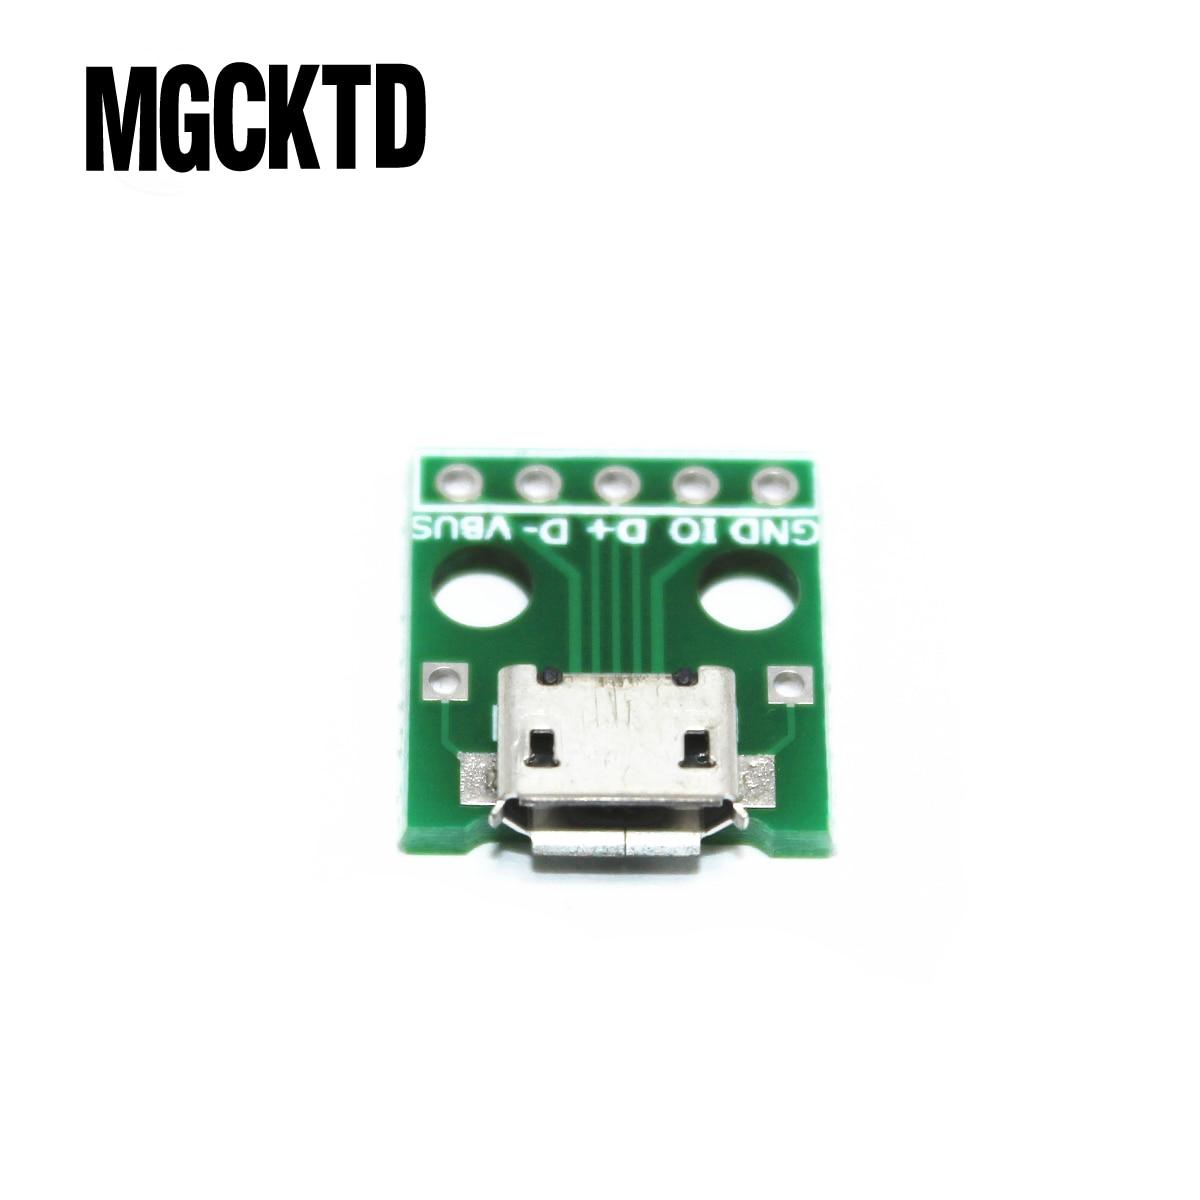 Q502 nuevo 50 piezas MICRO USB A DIP adaptador 5pin conector hembra tipo B pcb convertidor